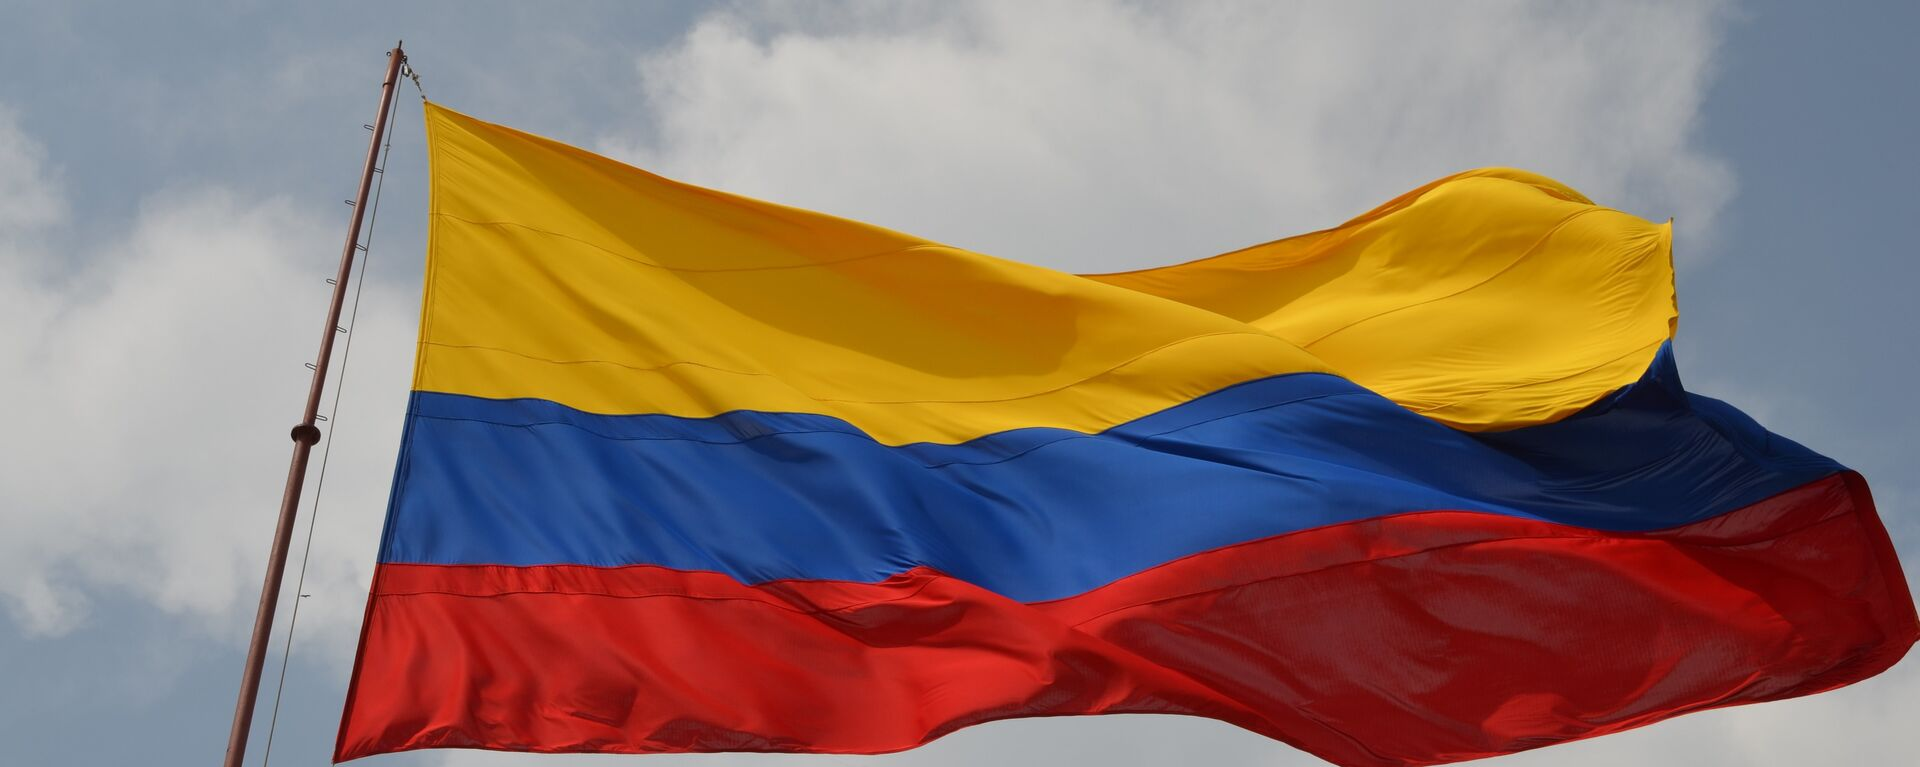 Bandera de Colombia - Sputnik Mundo, 1920, 10.09.2021